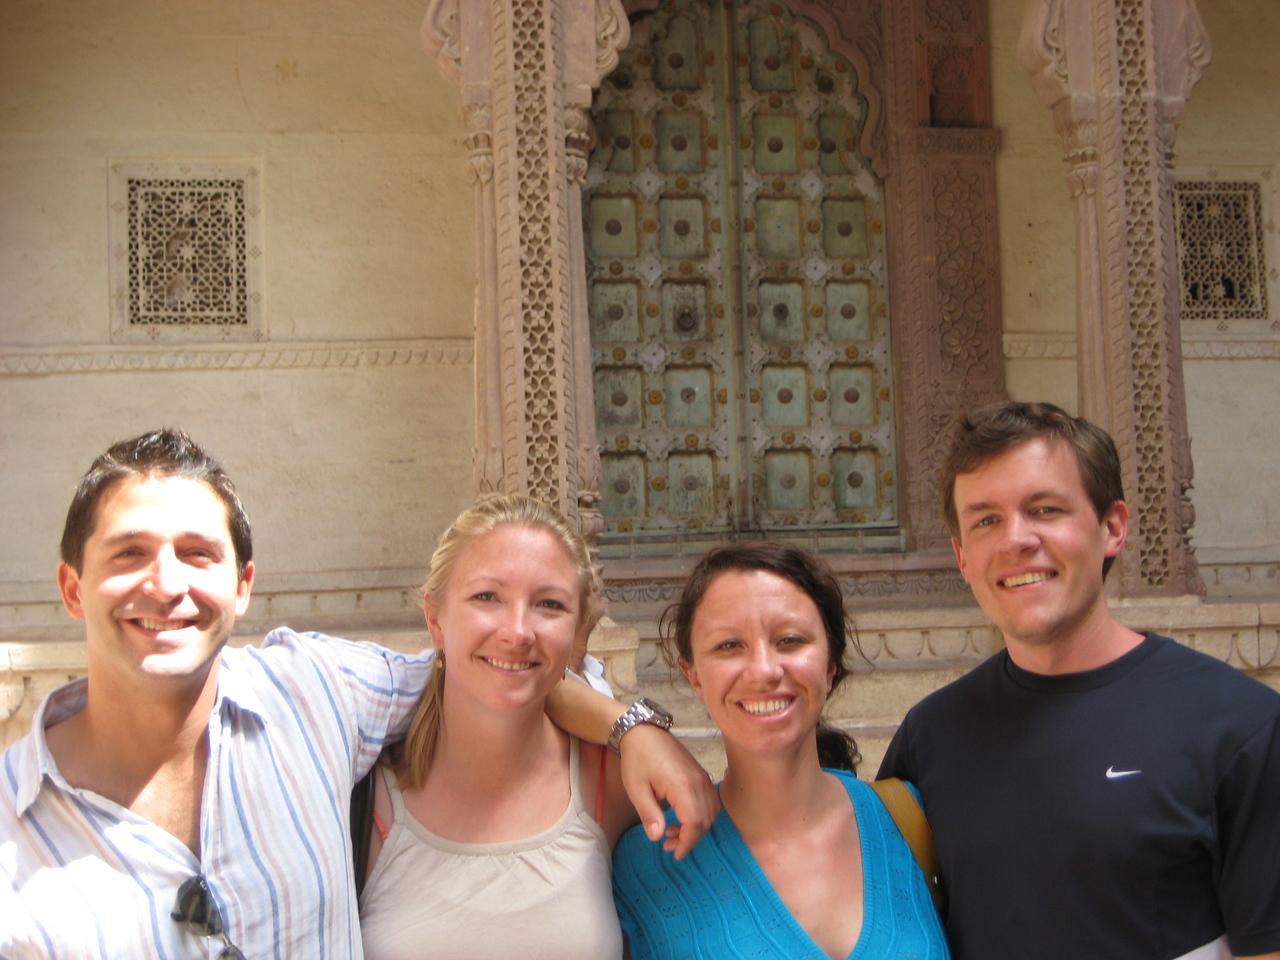 Brian, Detgen, Rochelle and Scott together at the Mehrangarh Fort in Jodhpur, India